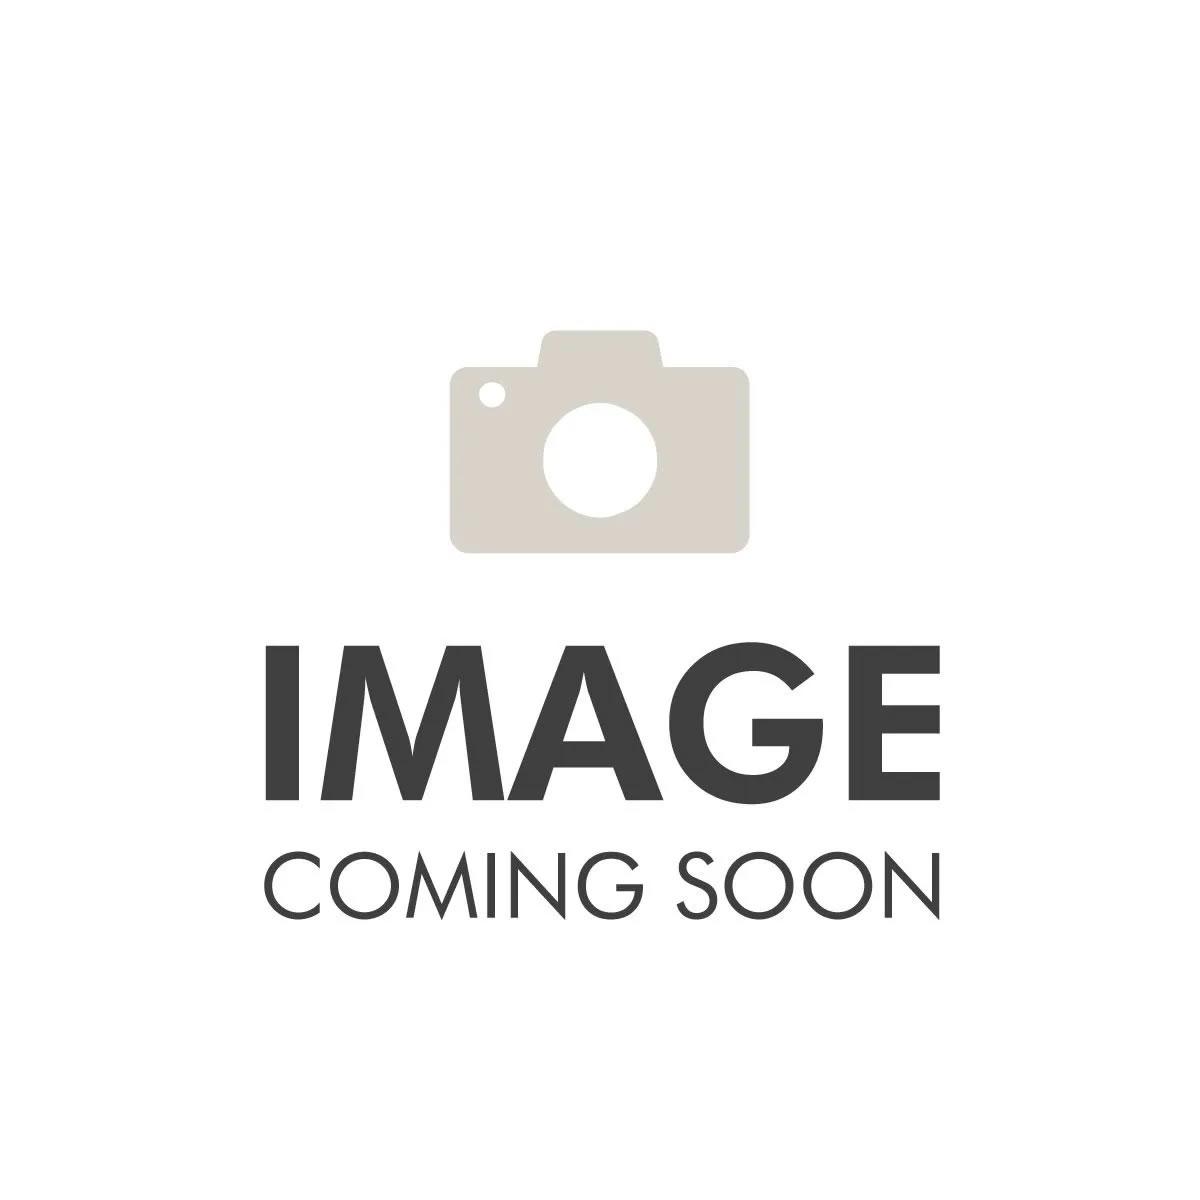 Steering Box Mounting Tie Plate; 78-86 Jeep CJ Models